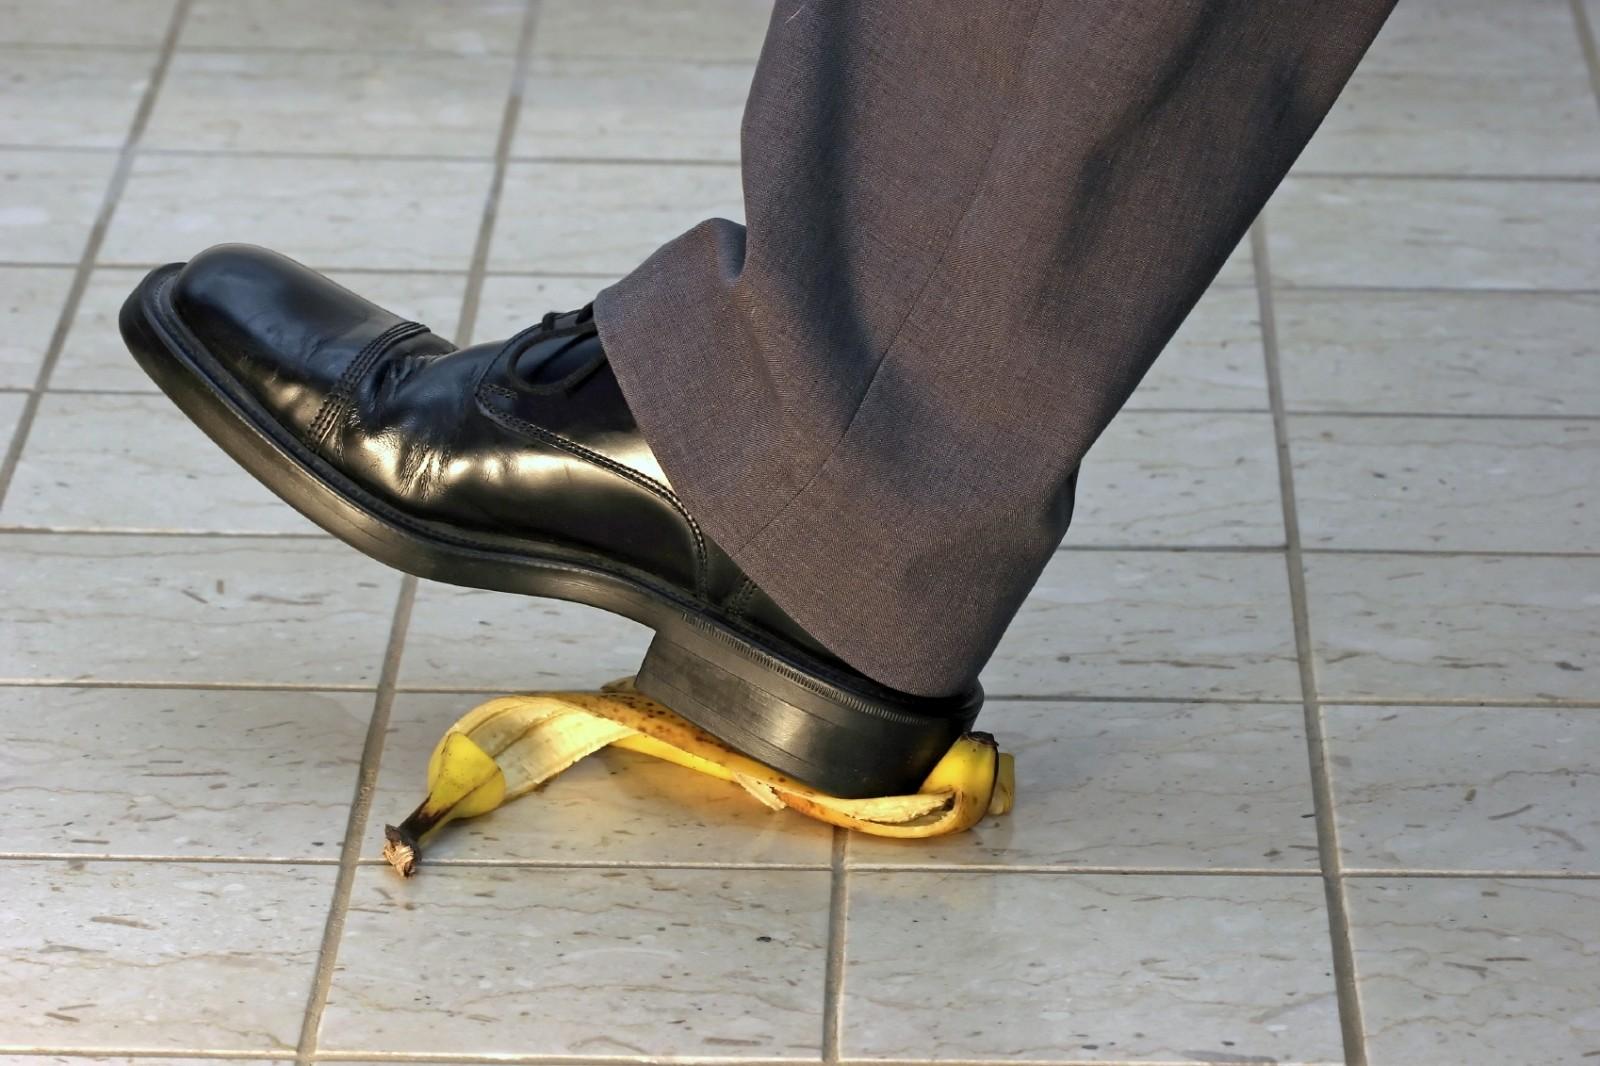 Next Stupid Internet Trend..... #BananaPeelChallenge